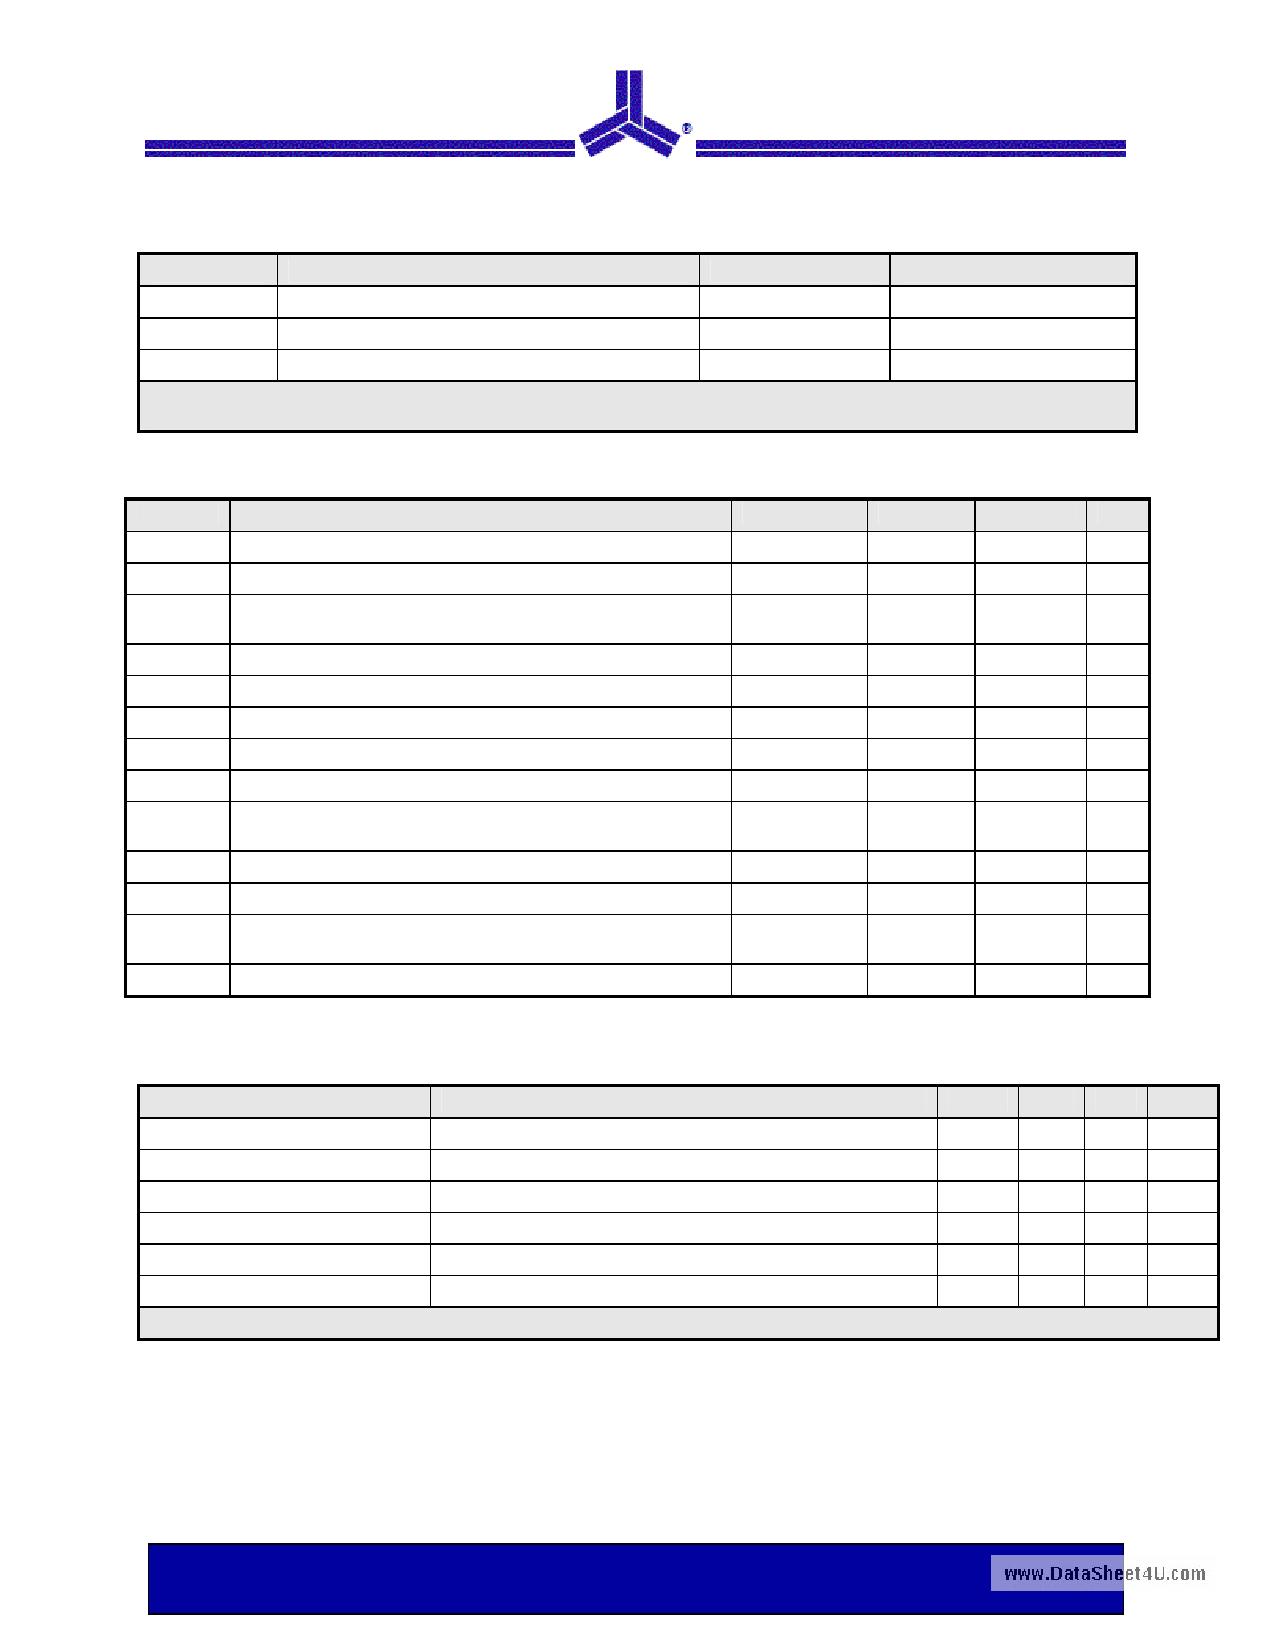 ASM3P2180A pdf, 電子部品, 半導体, ピン配列